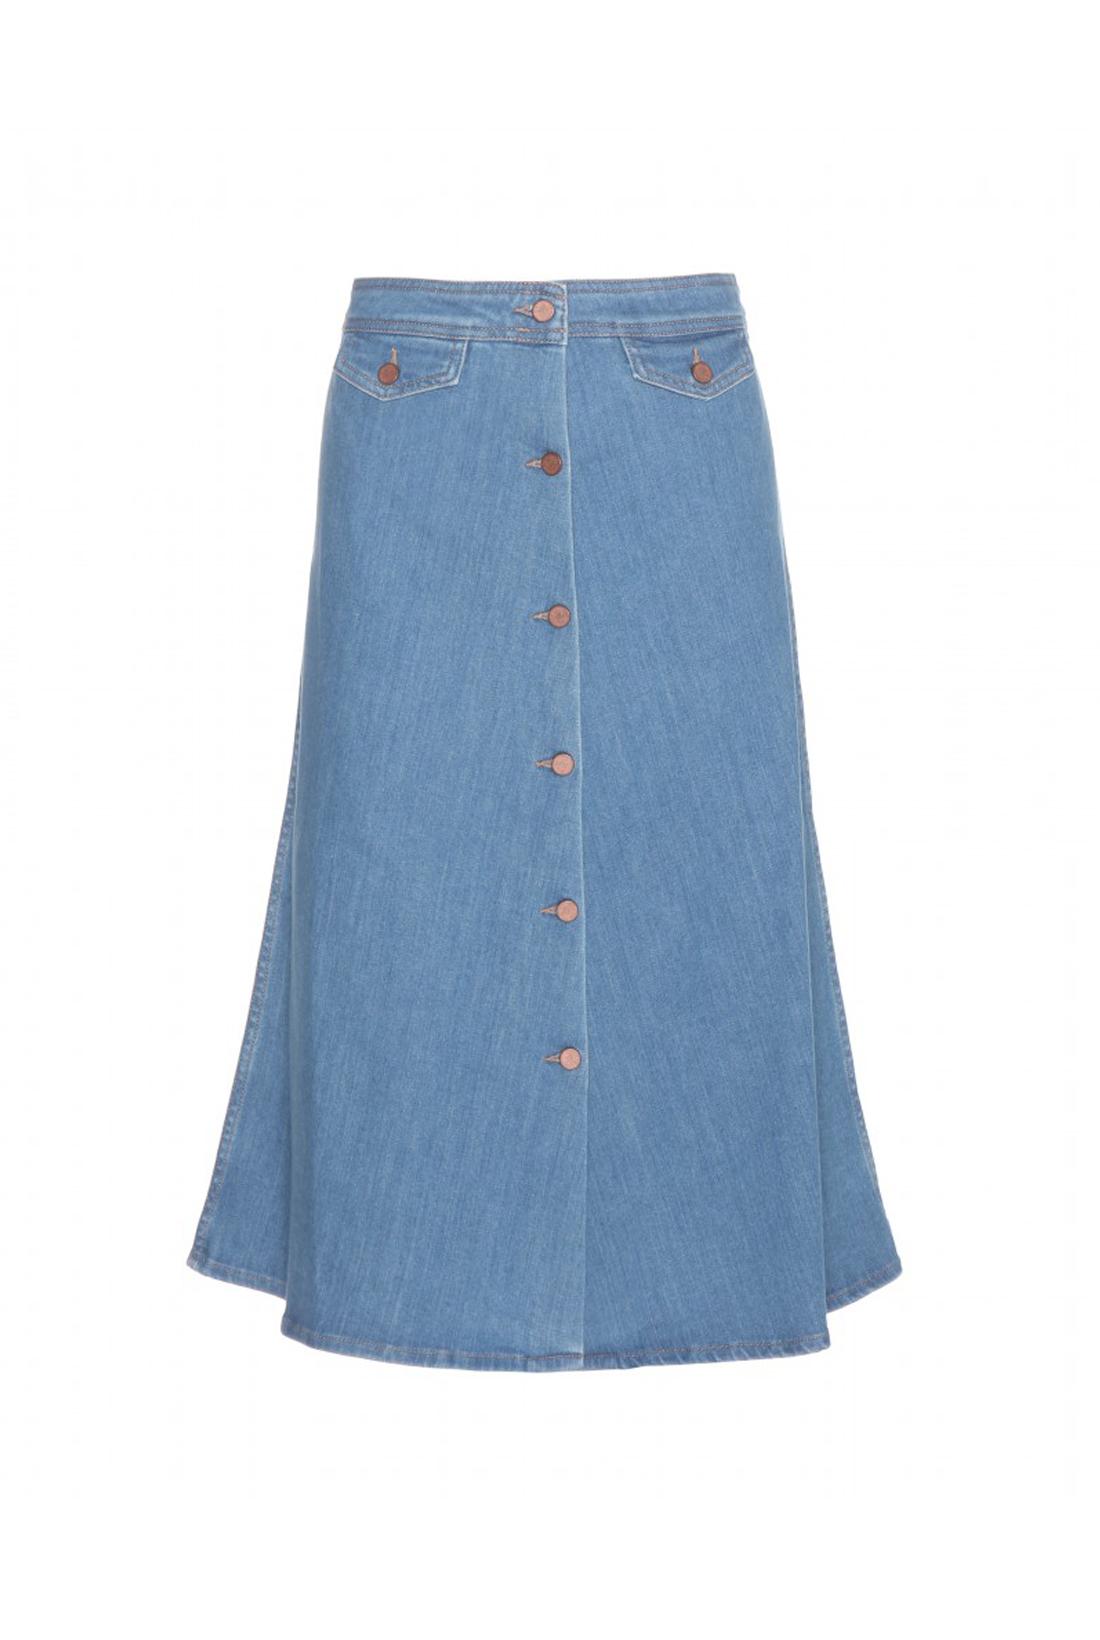 11-spring-denim-trends-button-down-skirt-03.jpg